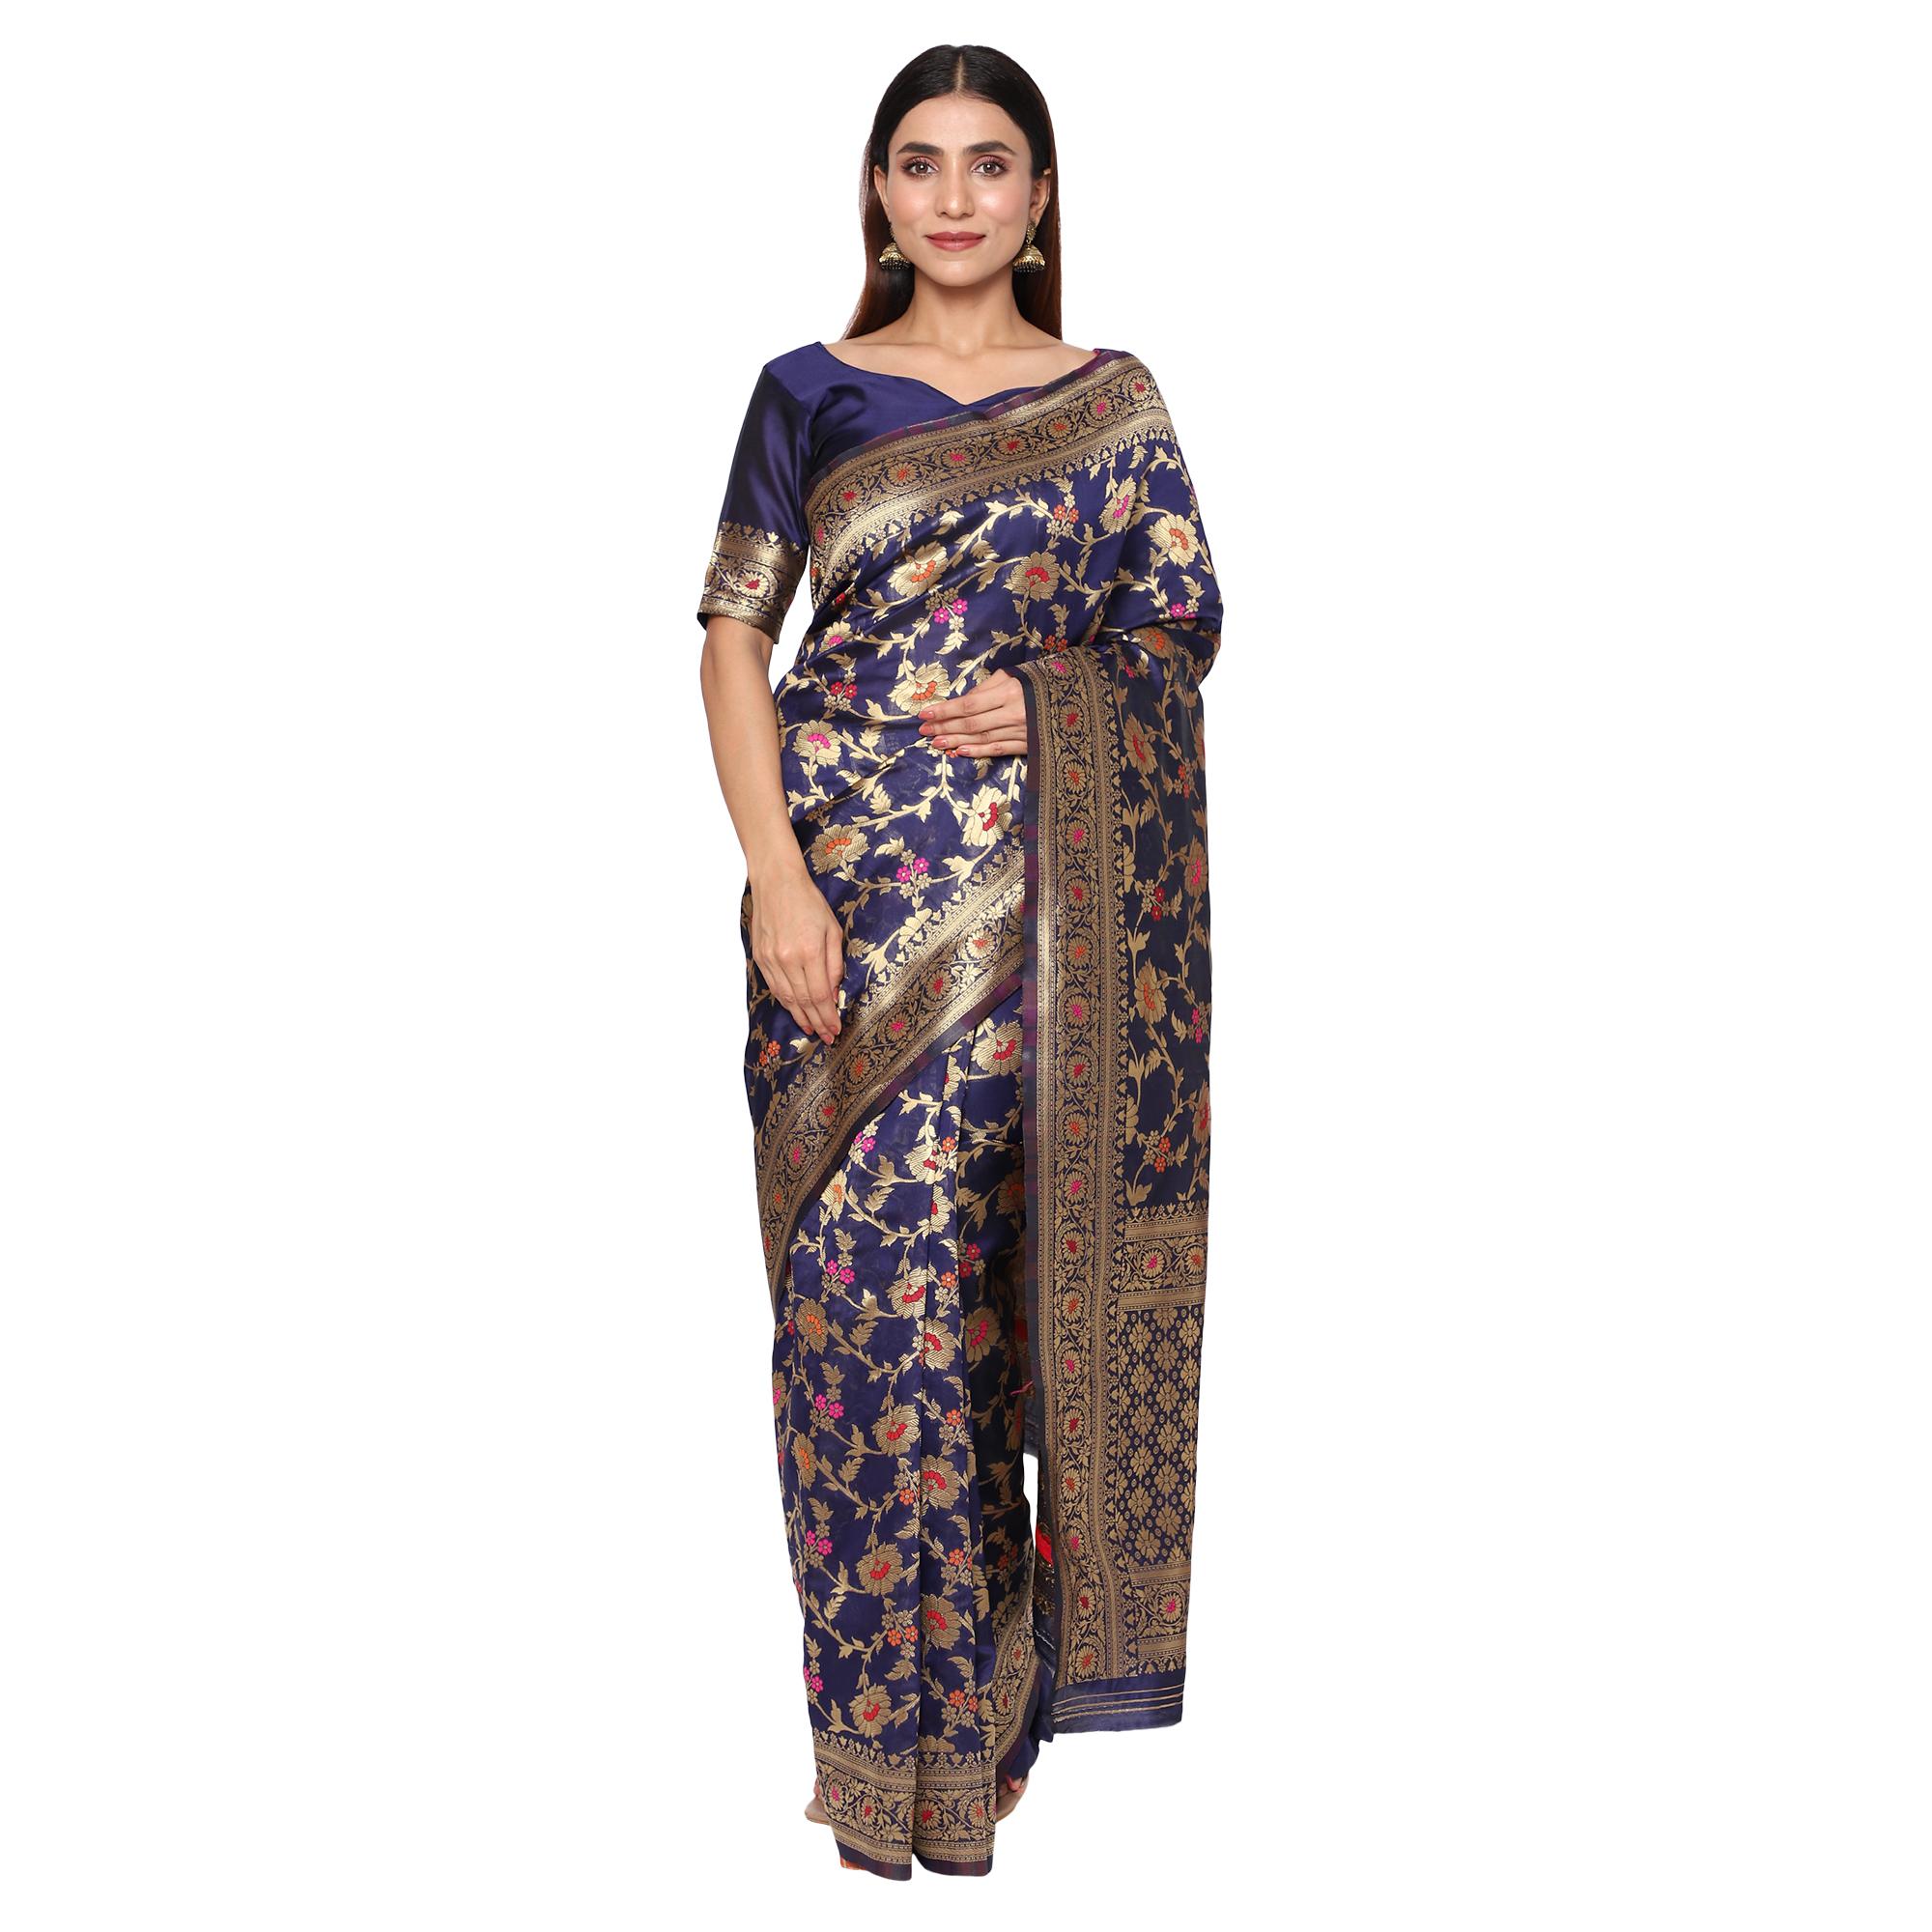 Glemora   Glemora Nevy Blue Beautiful Ethnic Wear Silk Blend Banarasi Traditional Saree